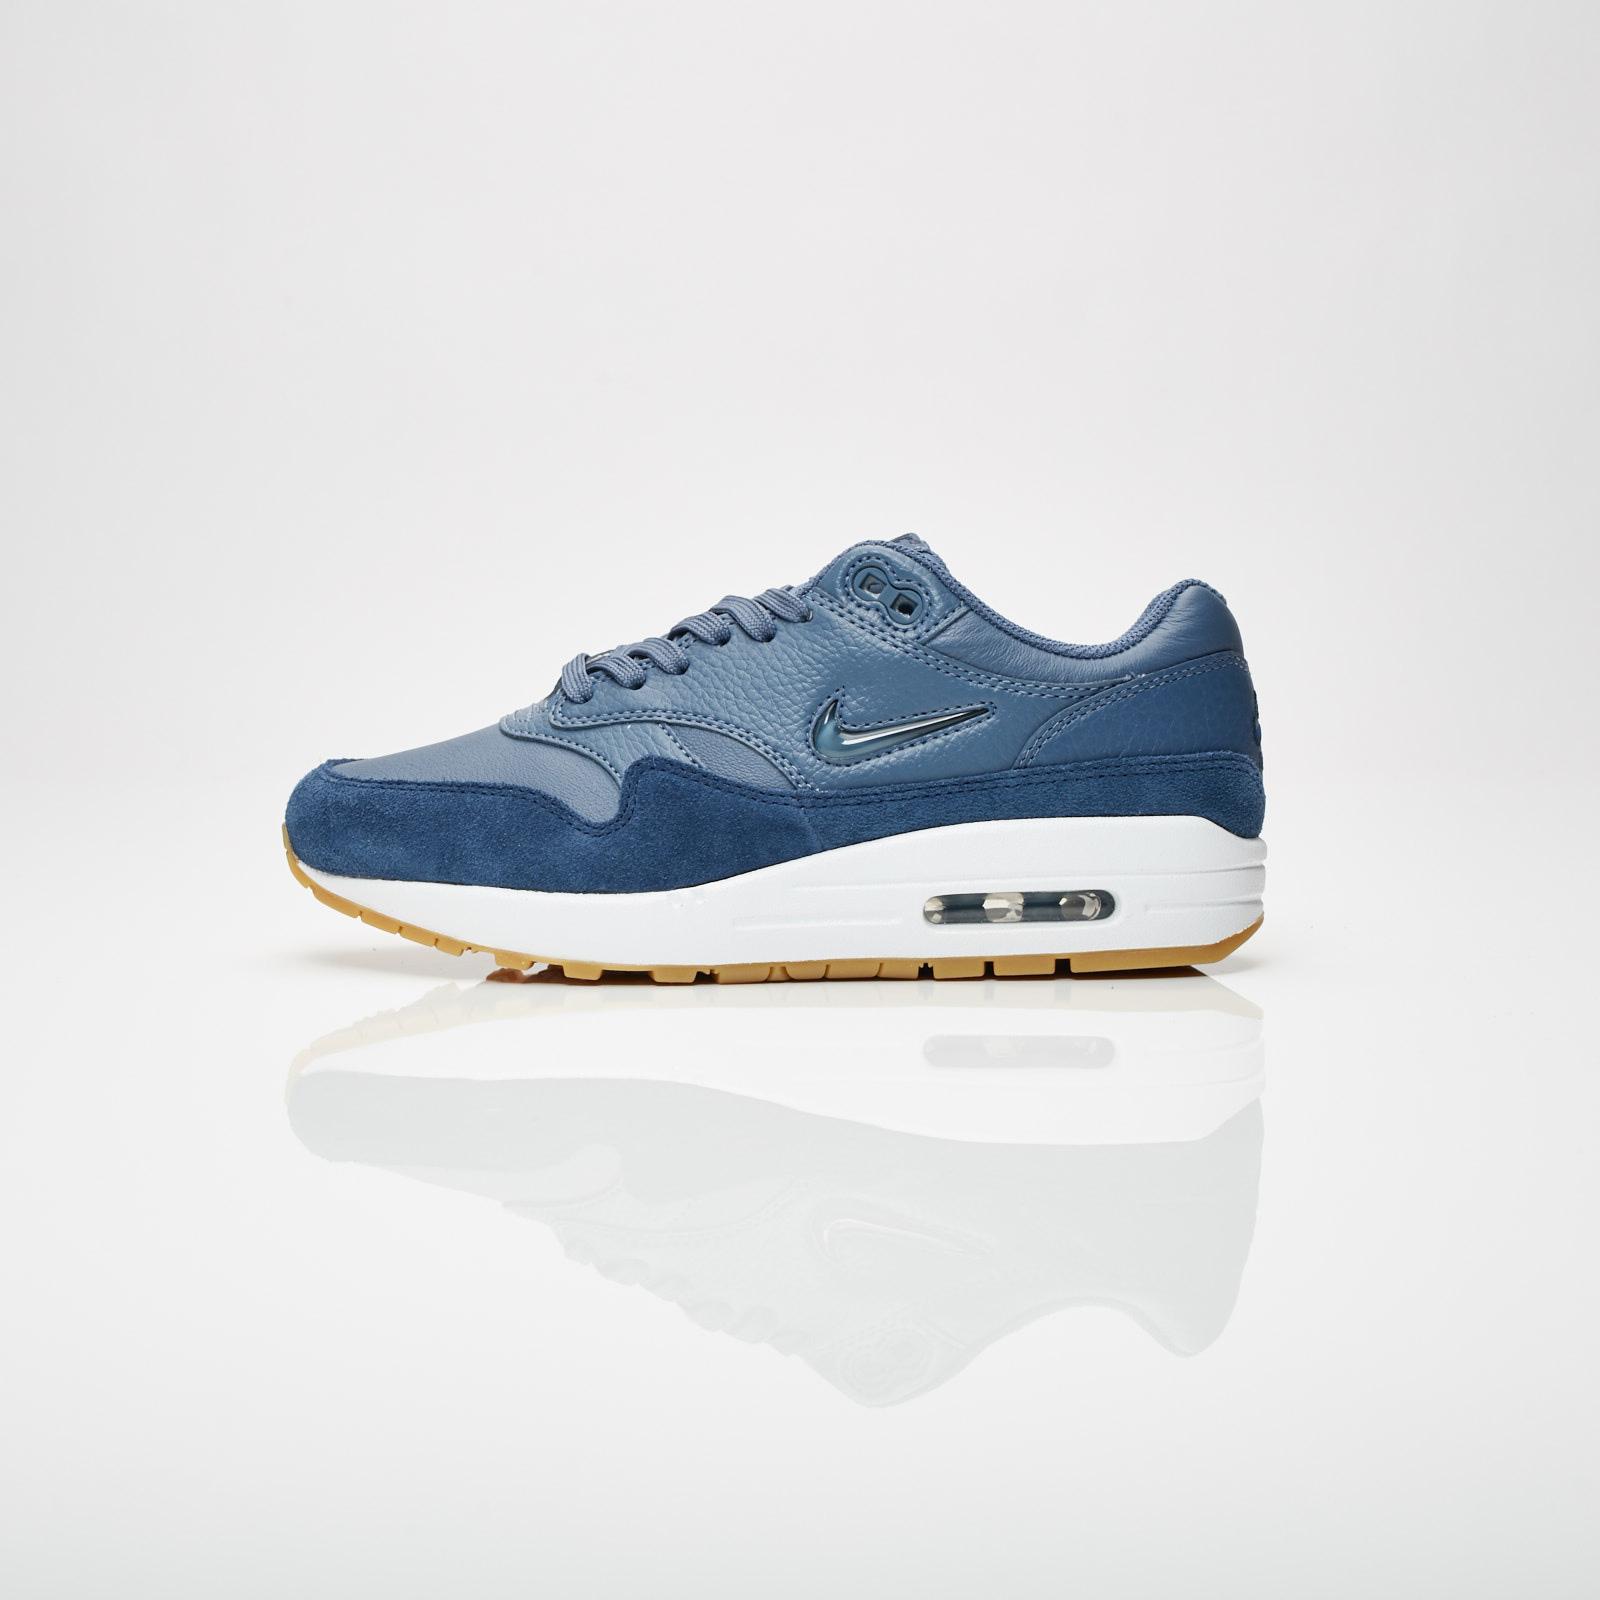 Nike Wmns Air Max 1 Premium SC Aa0512 400 Sneakersnstuff